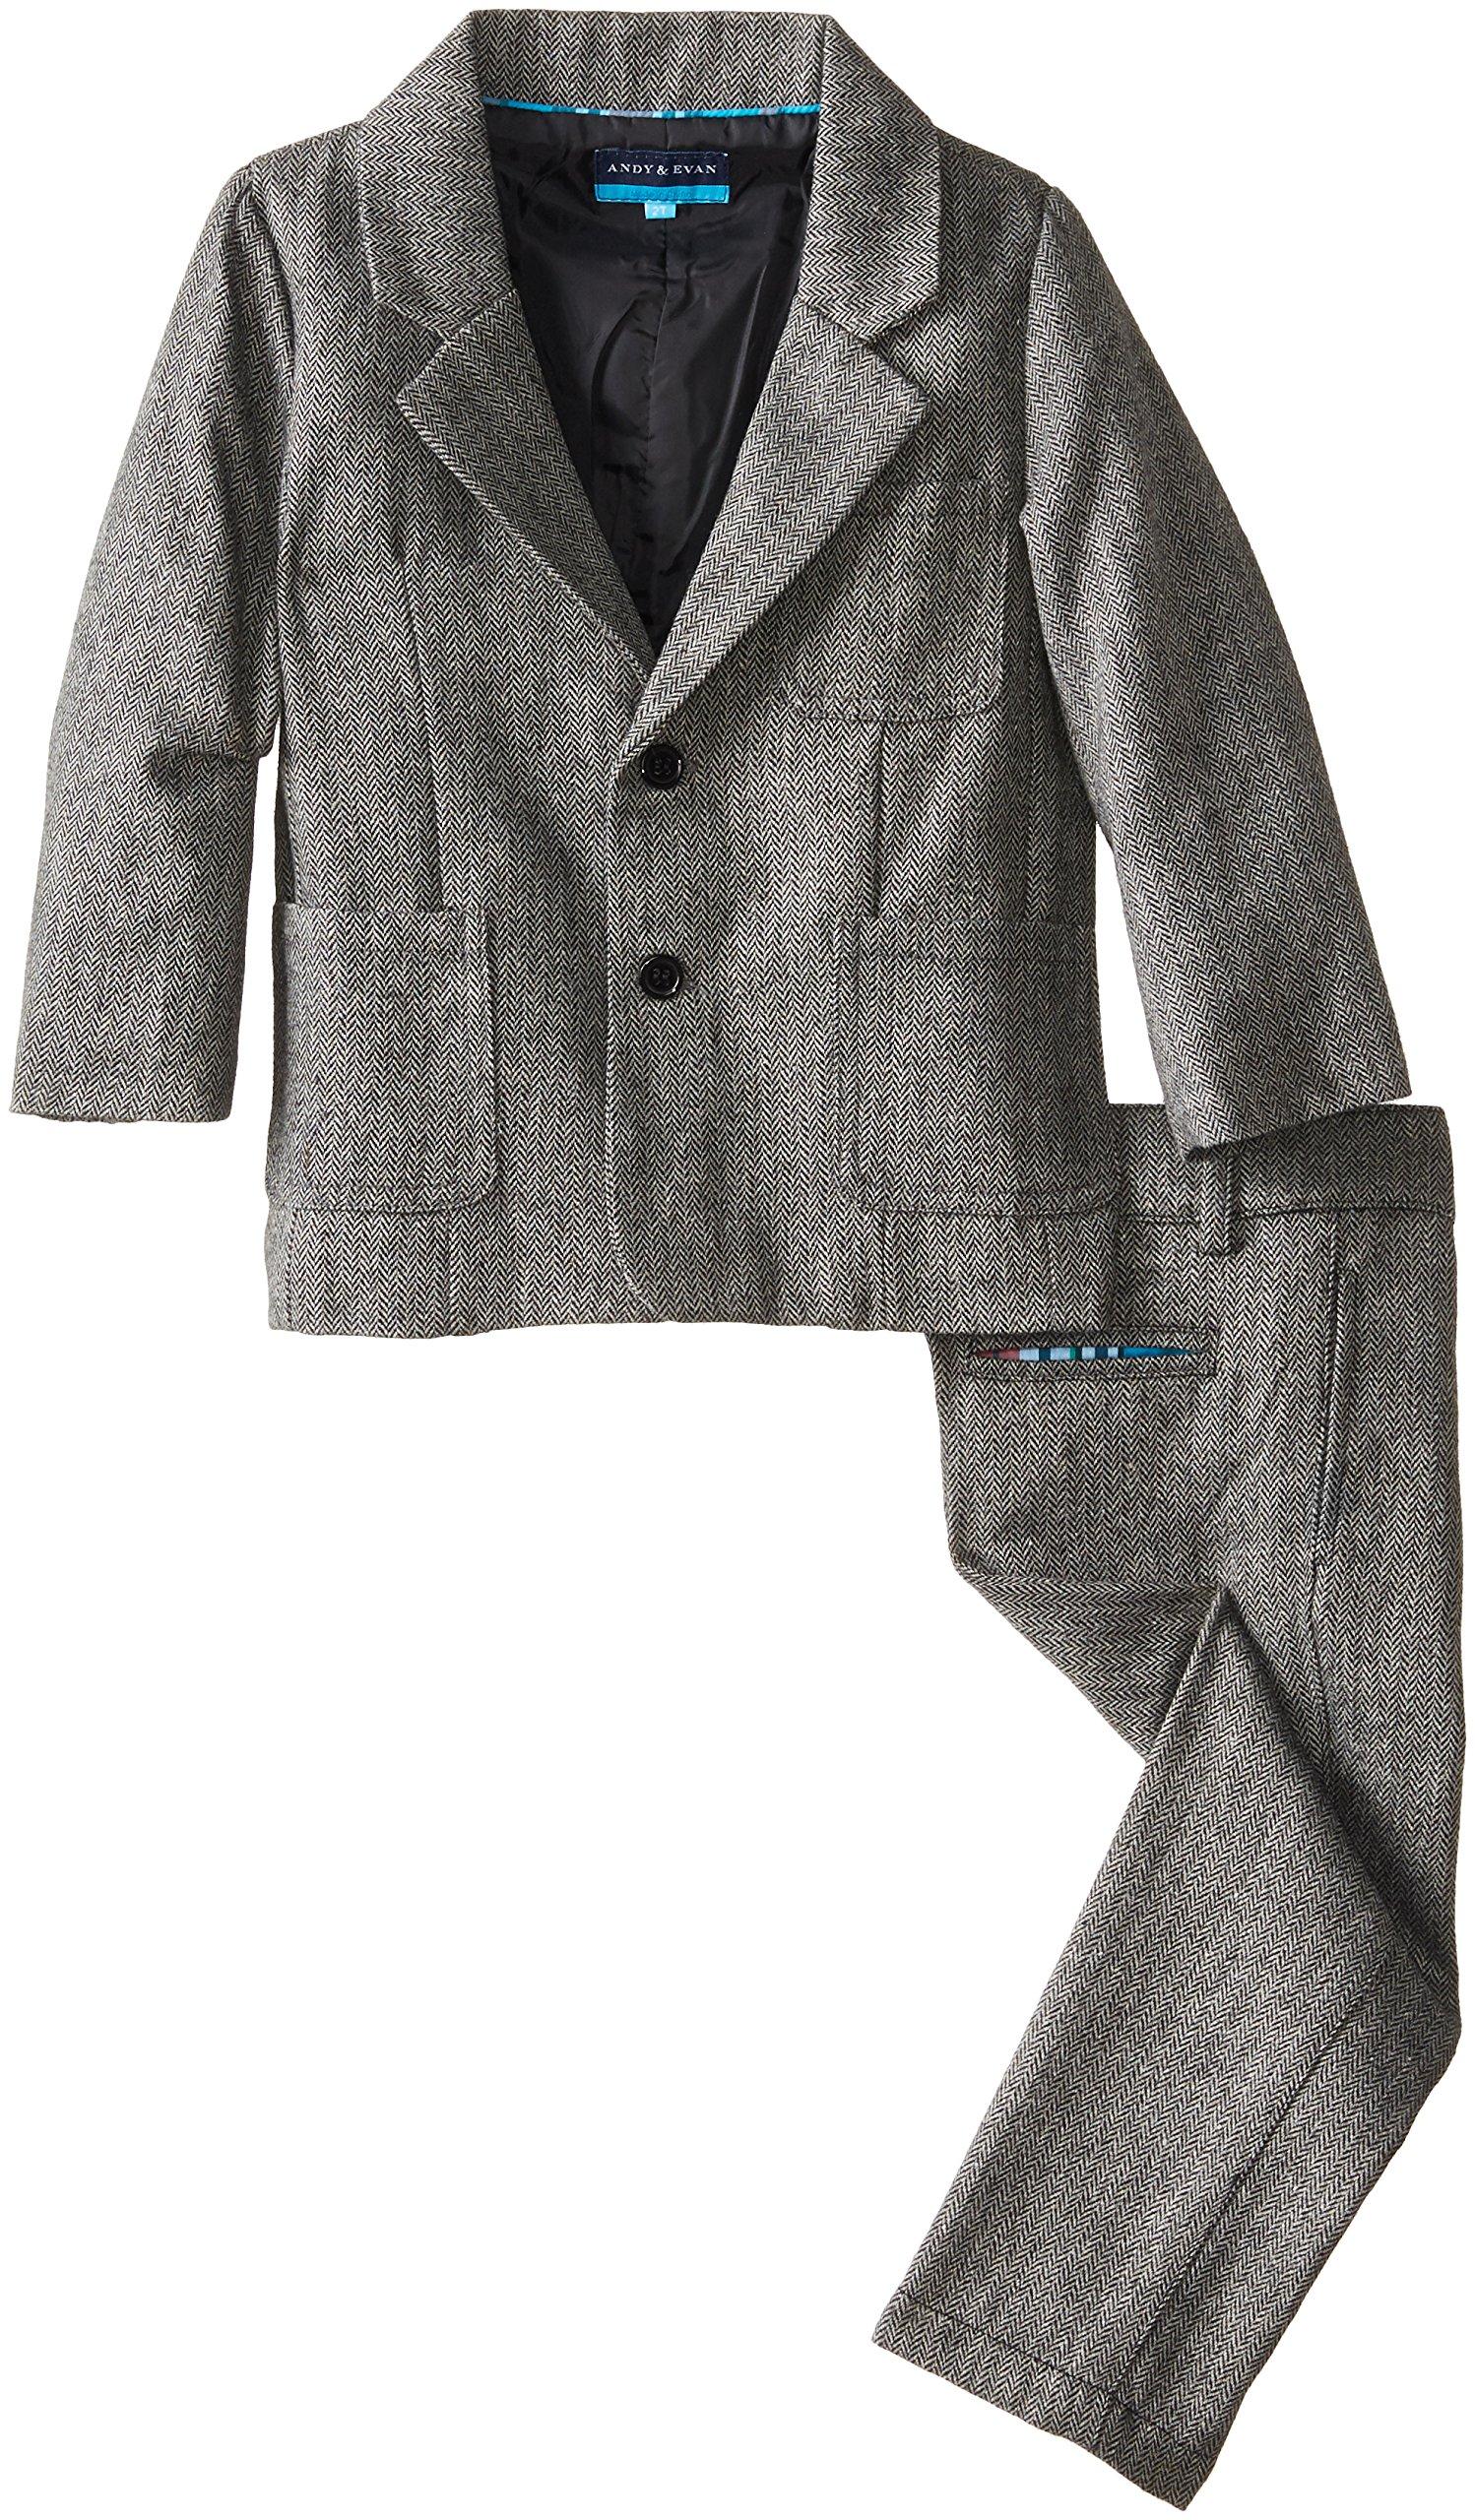 Andy & Evan Little Boys' Herringbone Jacket and Pant Set, Charcoal, 5Y